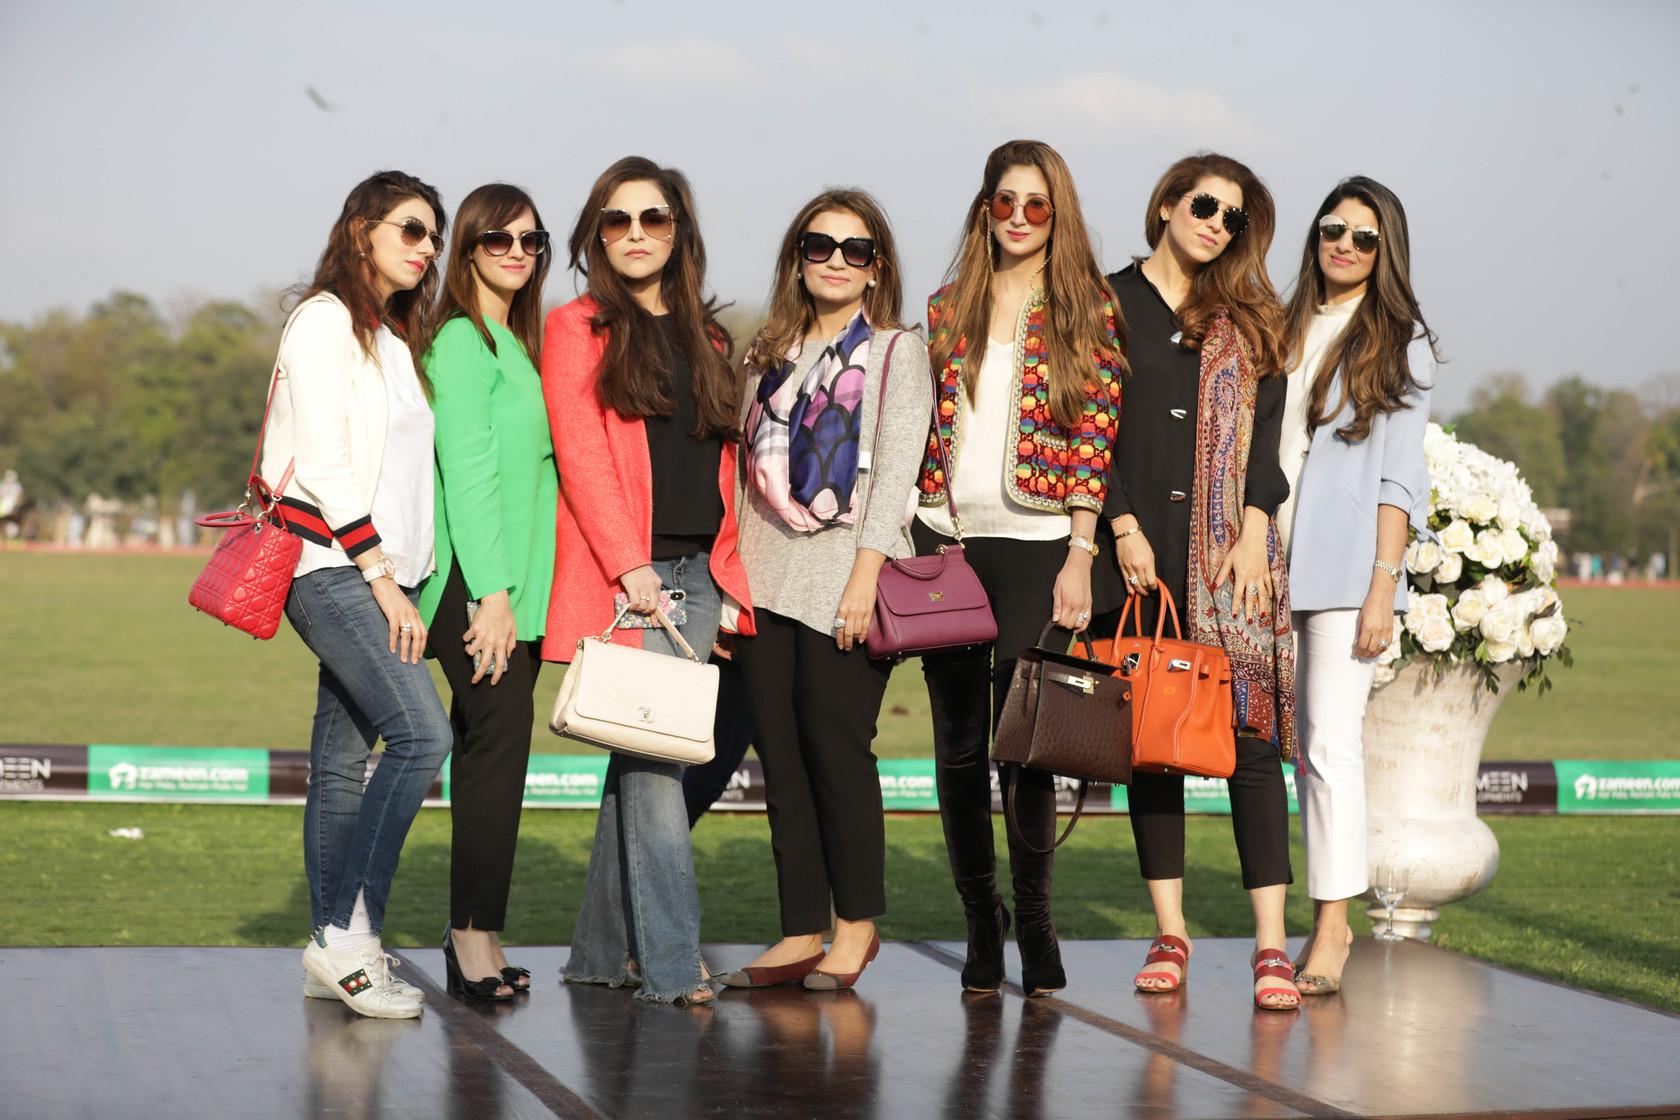 Maryam Ahmed, Aleen Nasar, Amina Junaid, Madiha Hassan, Amna Zeeshan Khan, Afifa Hussain, Sana Ashraf